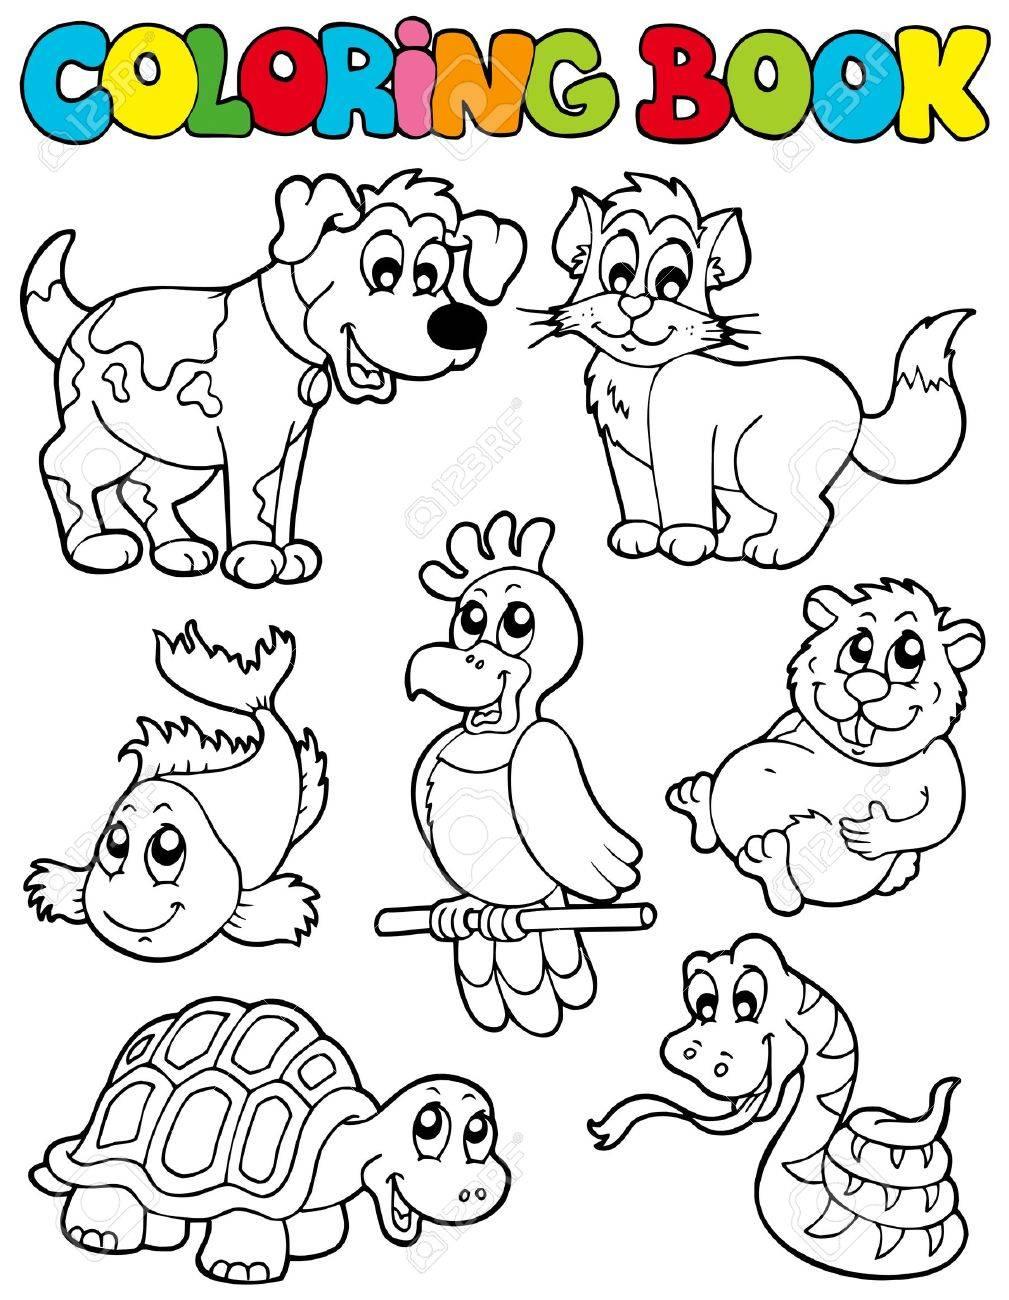 Libro Para Colorear Con Mascotas Ilustración